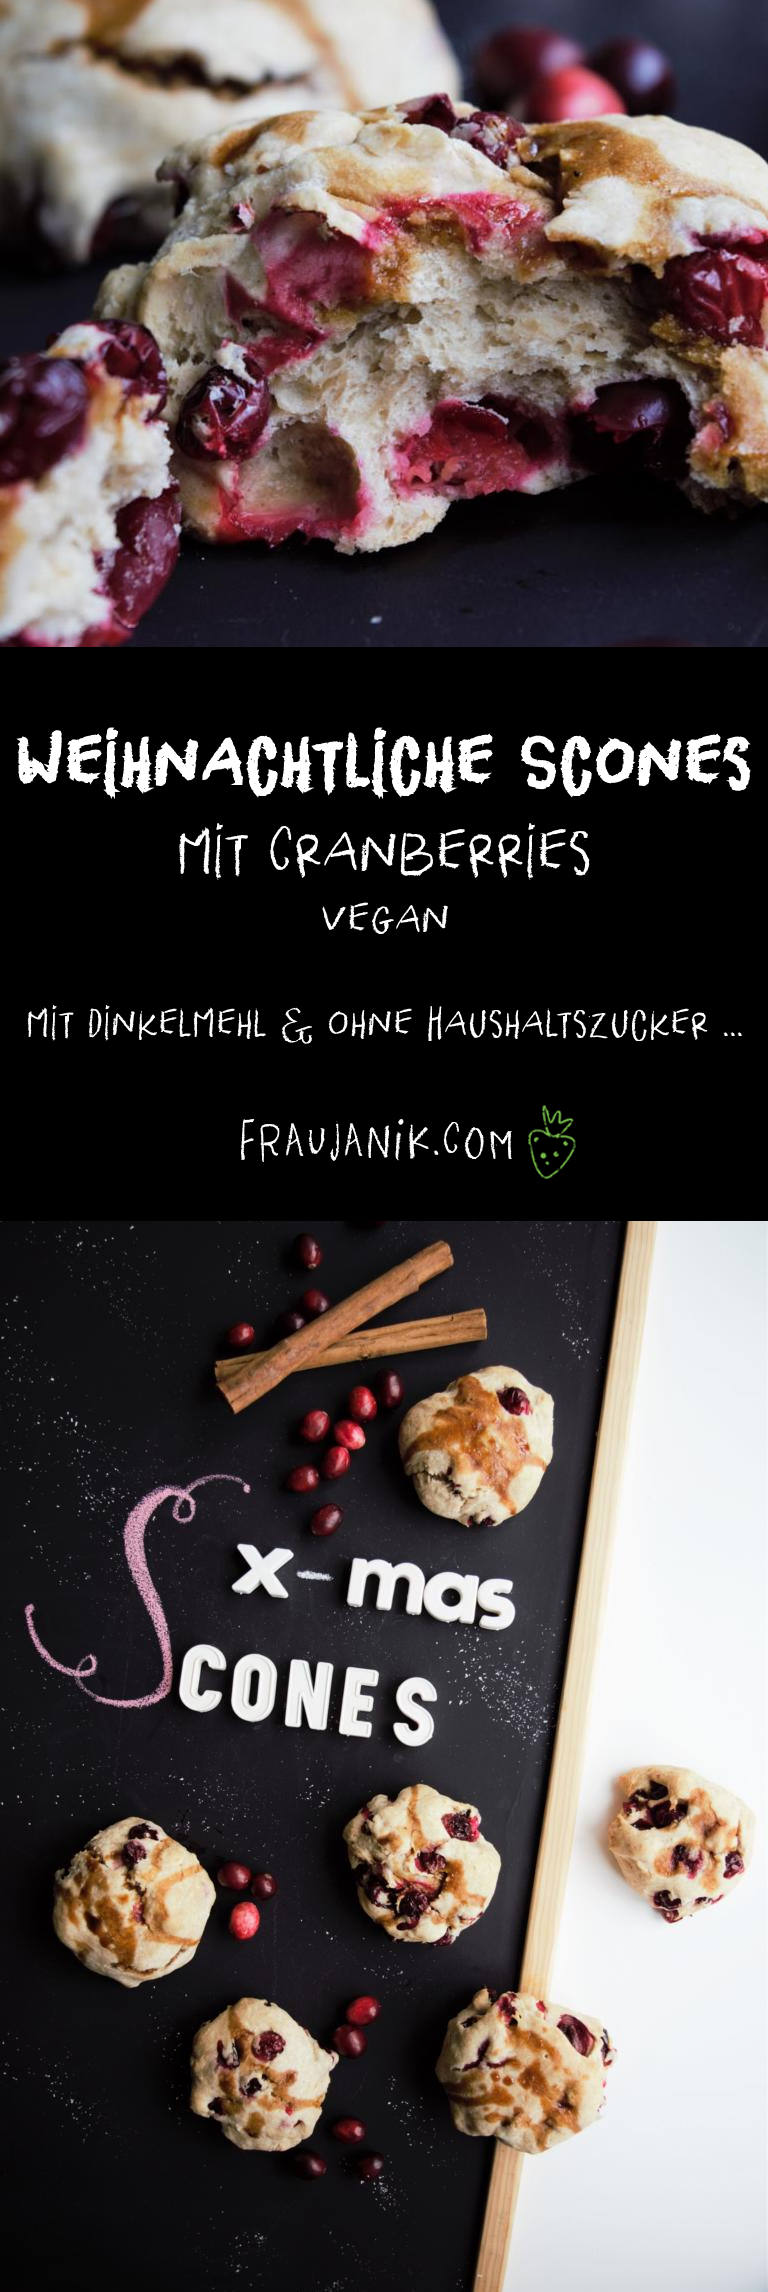 Scones Cranberrys, vegan, ohne zucker